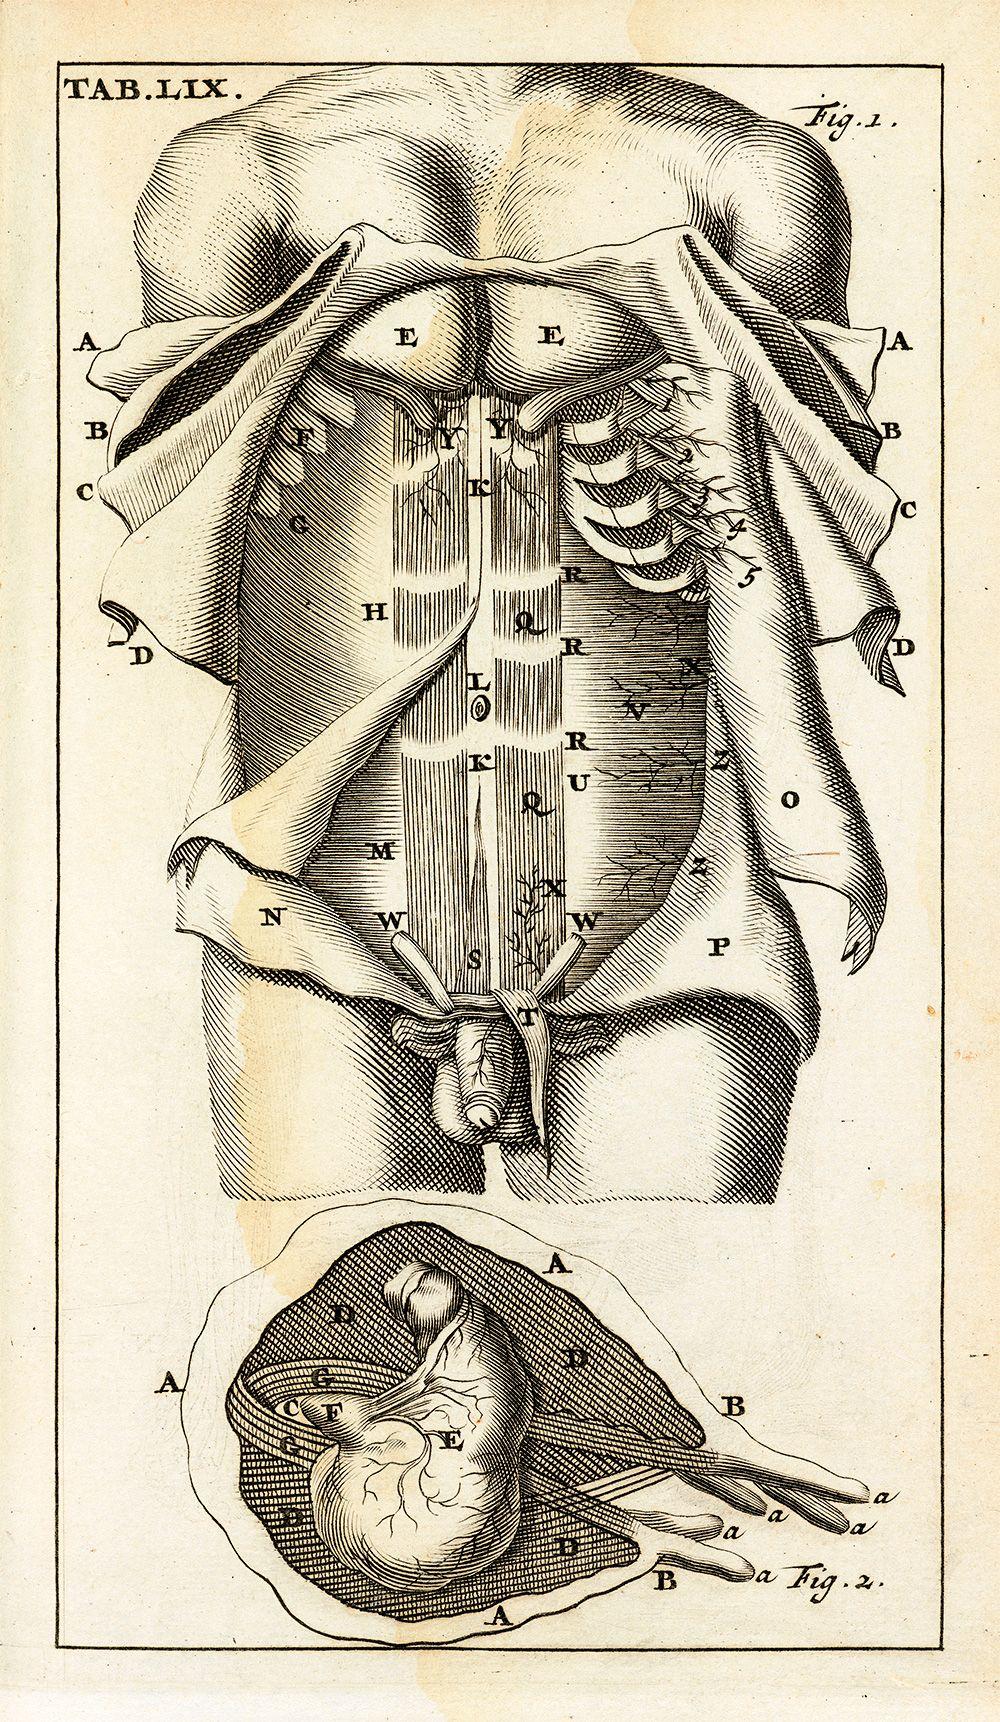 Anatomia Reformata, Tab LIX,\